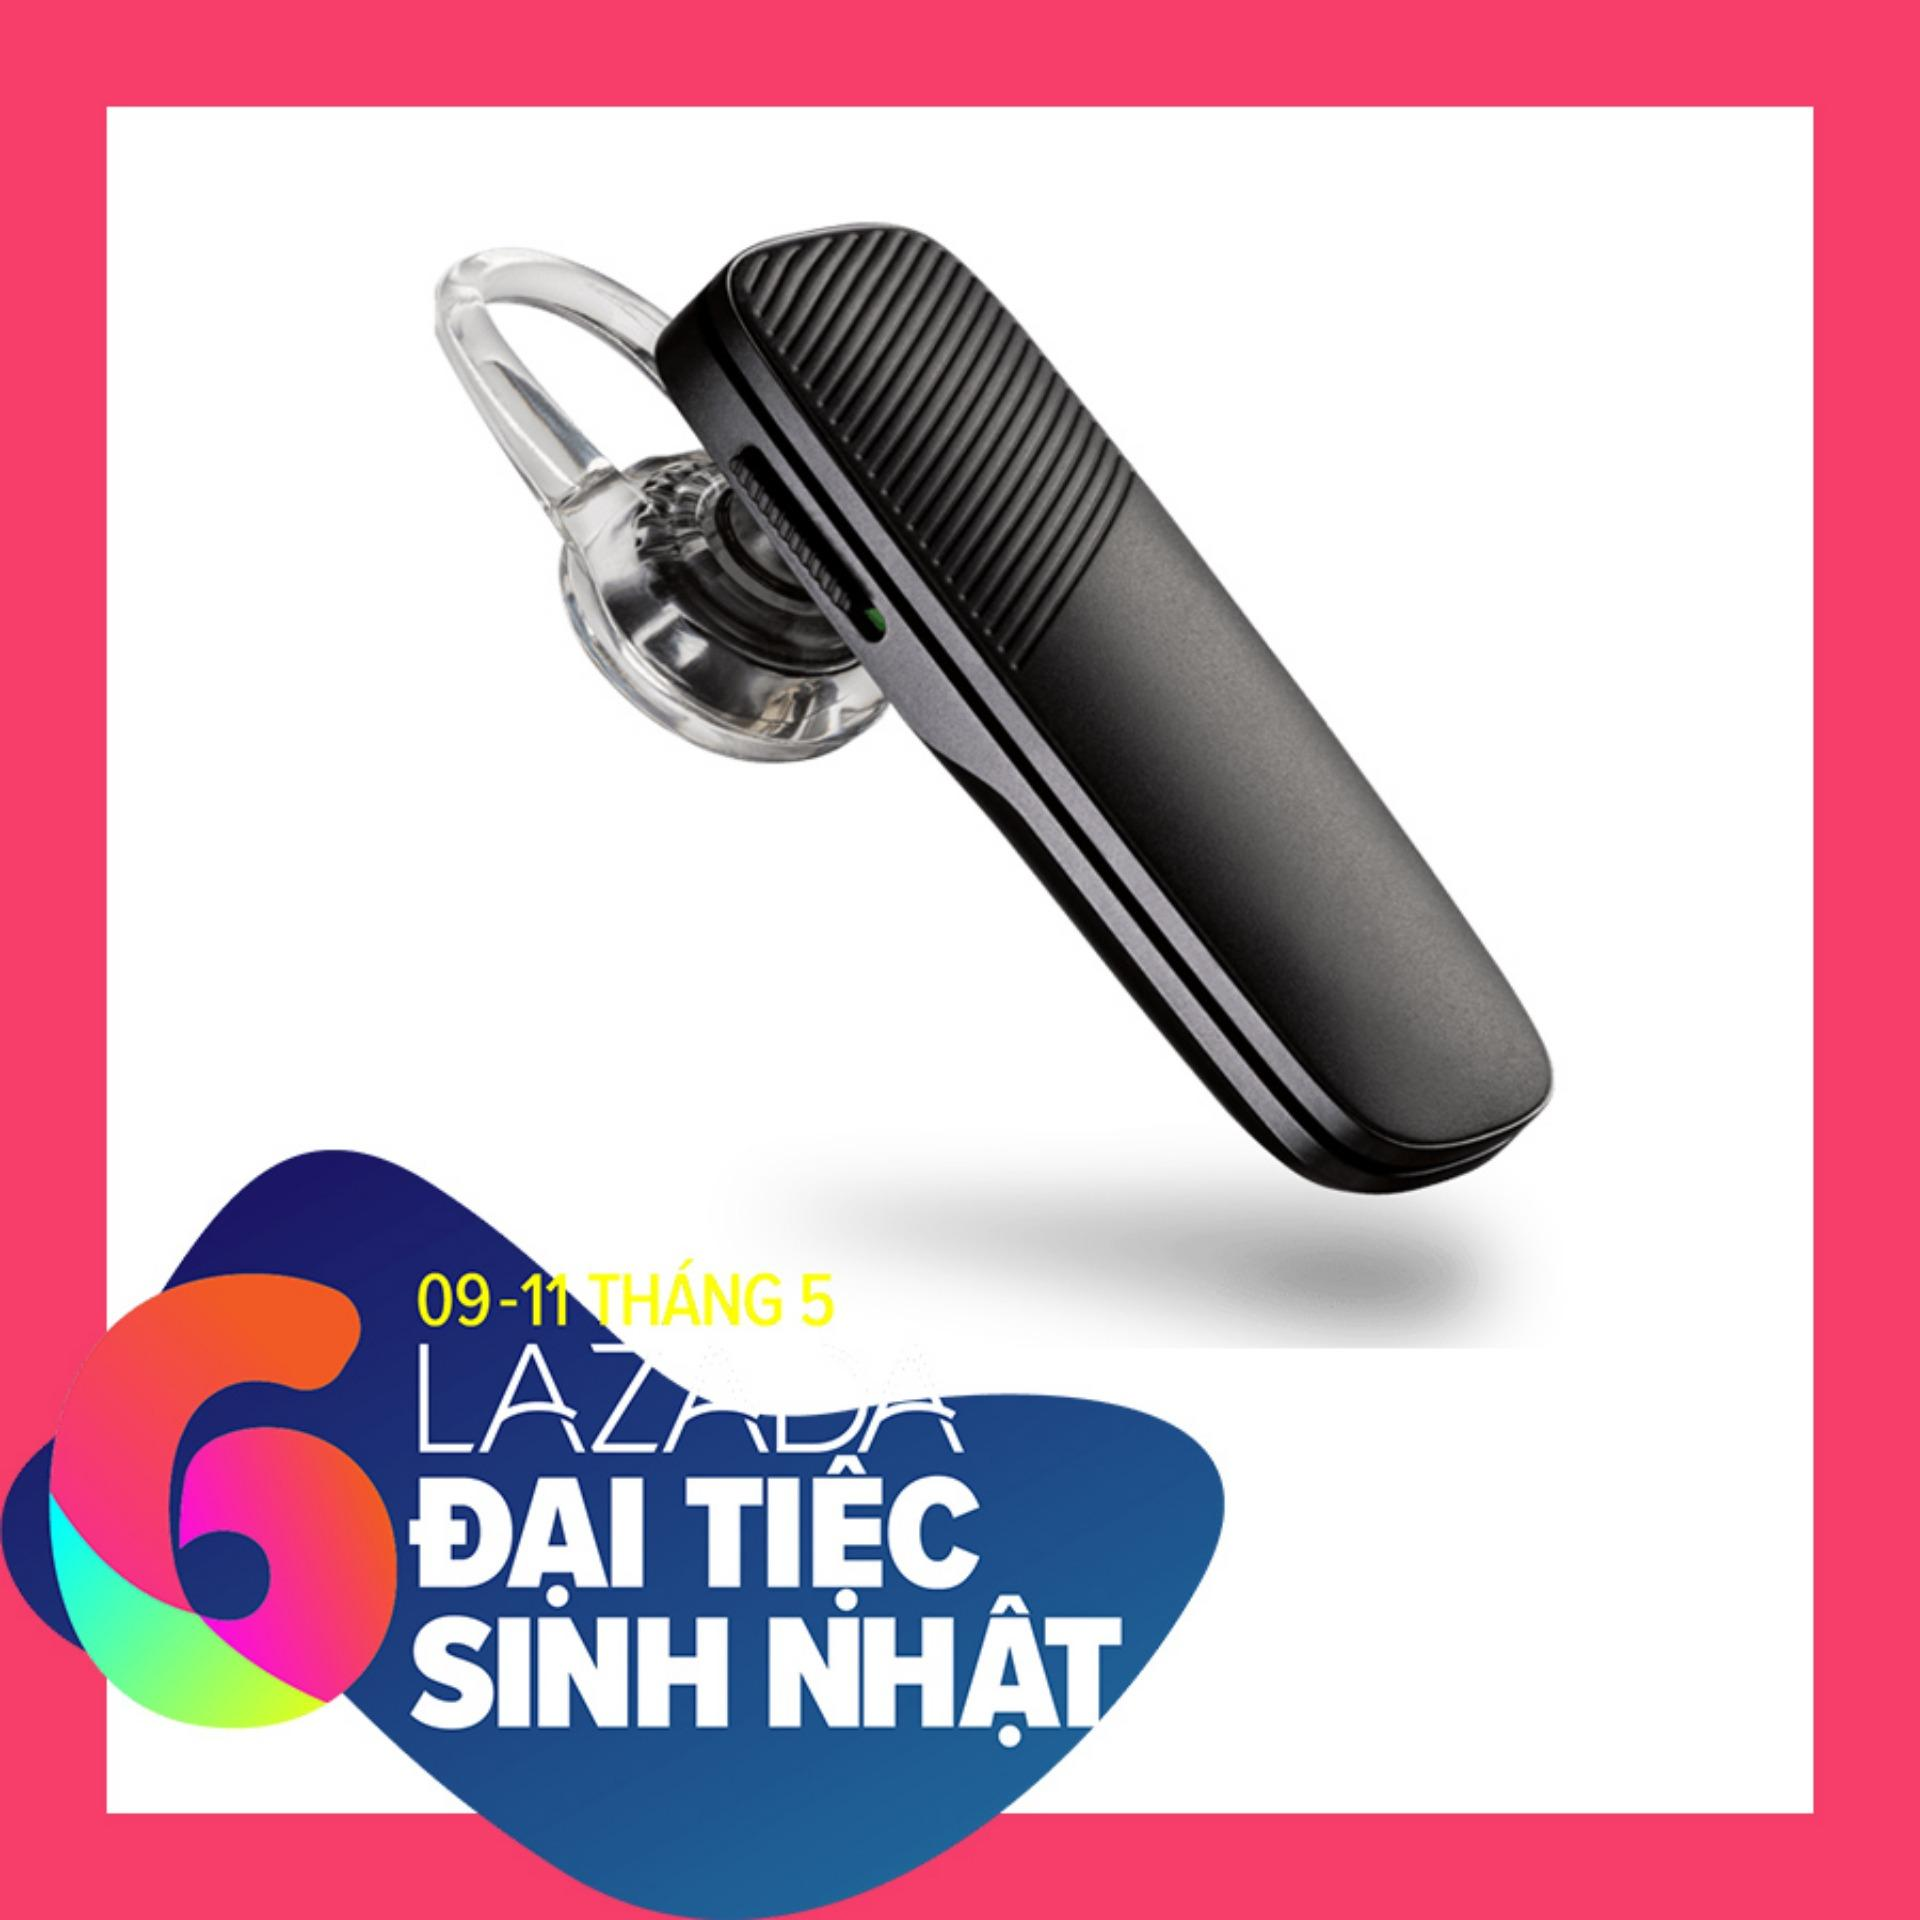 Tai Nghe Bluetooth Plantronics Explorer 500 Xam Plantronics Chiết Khấu 30